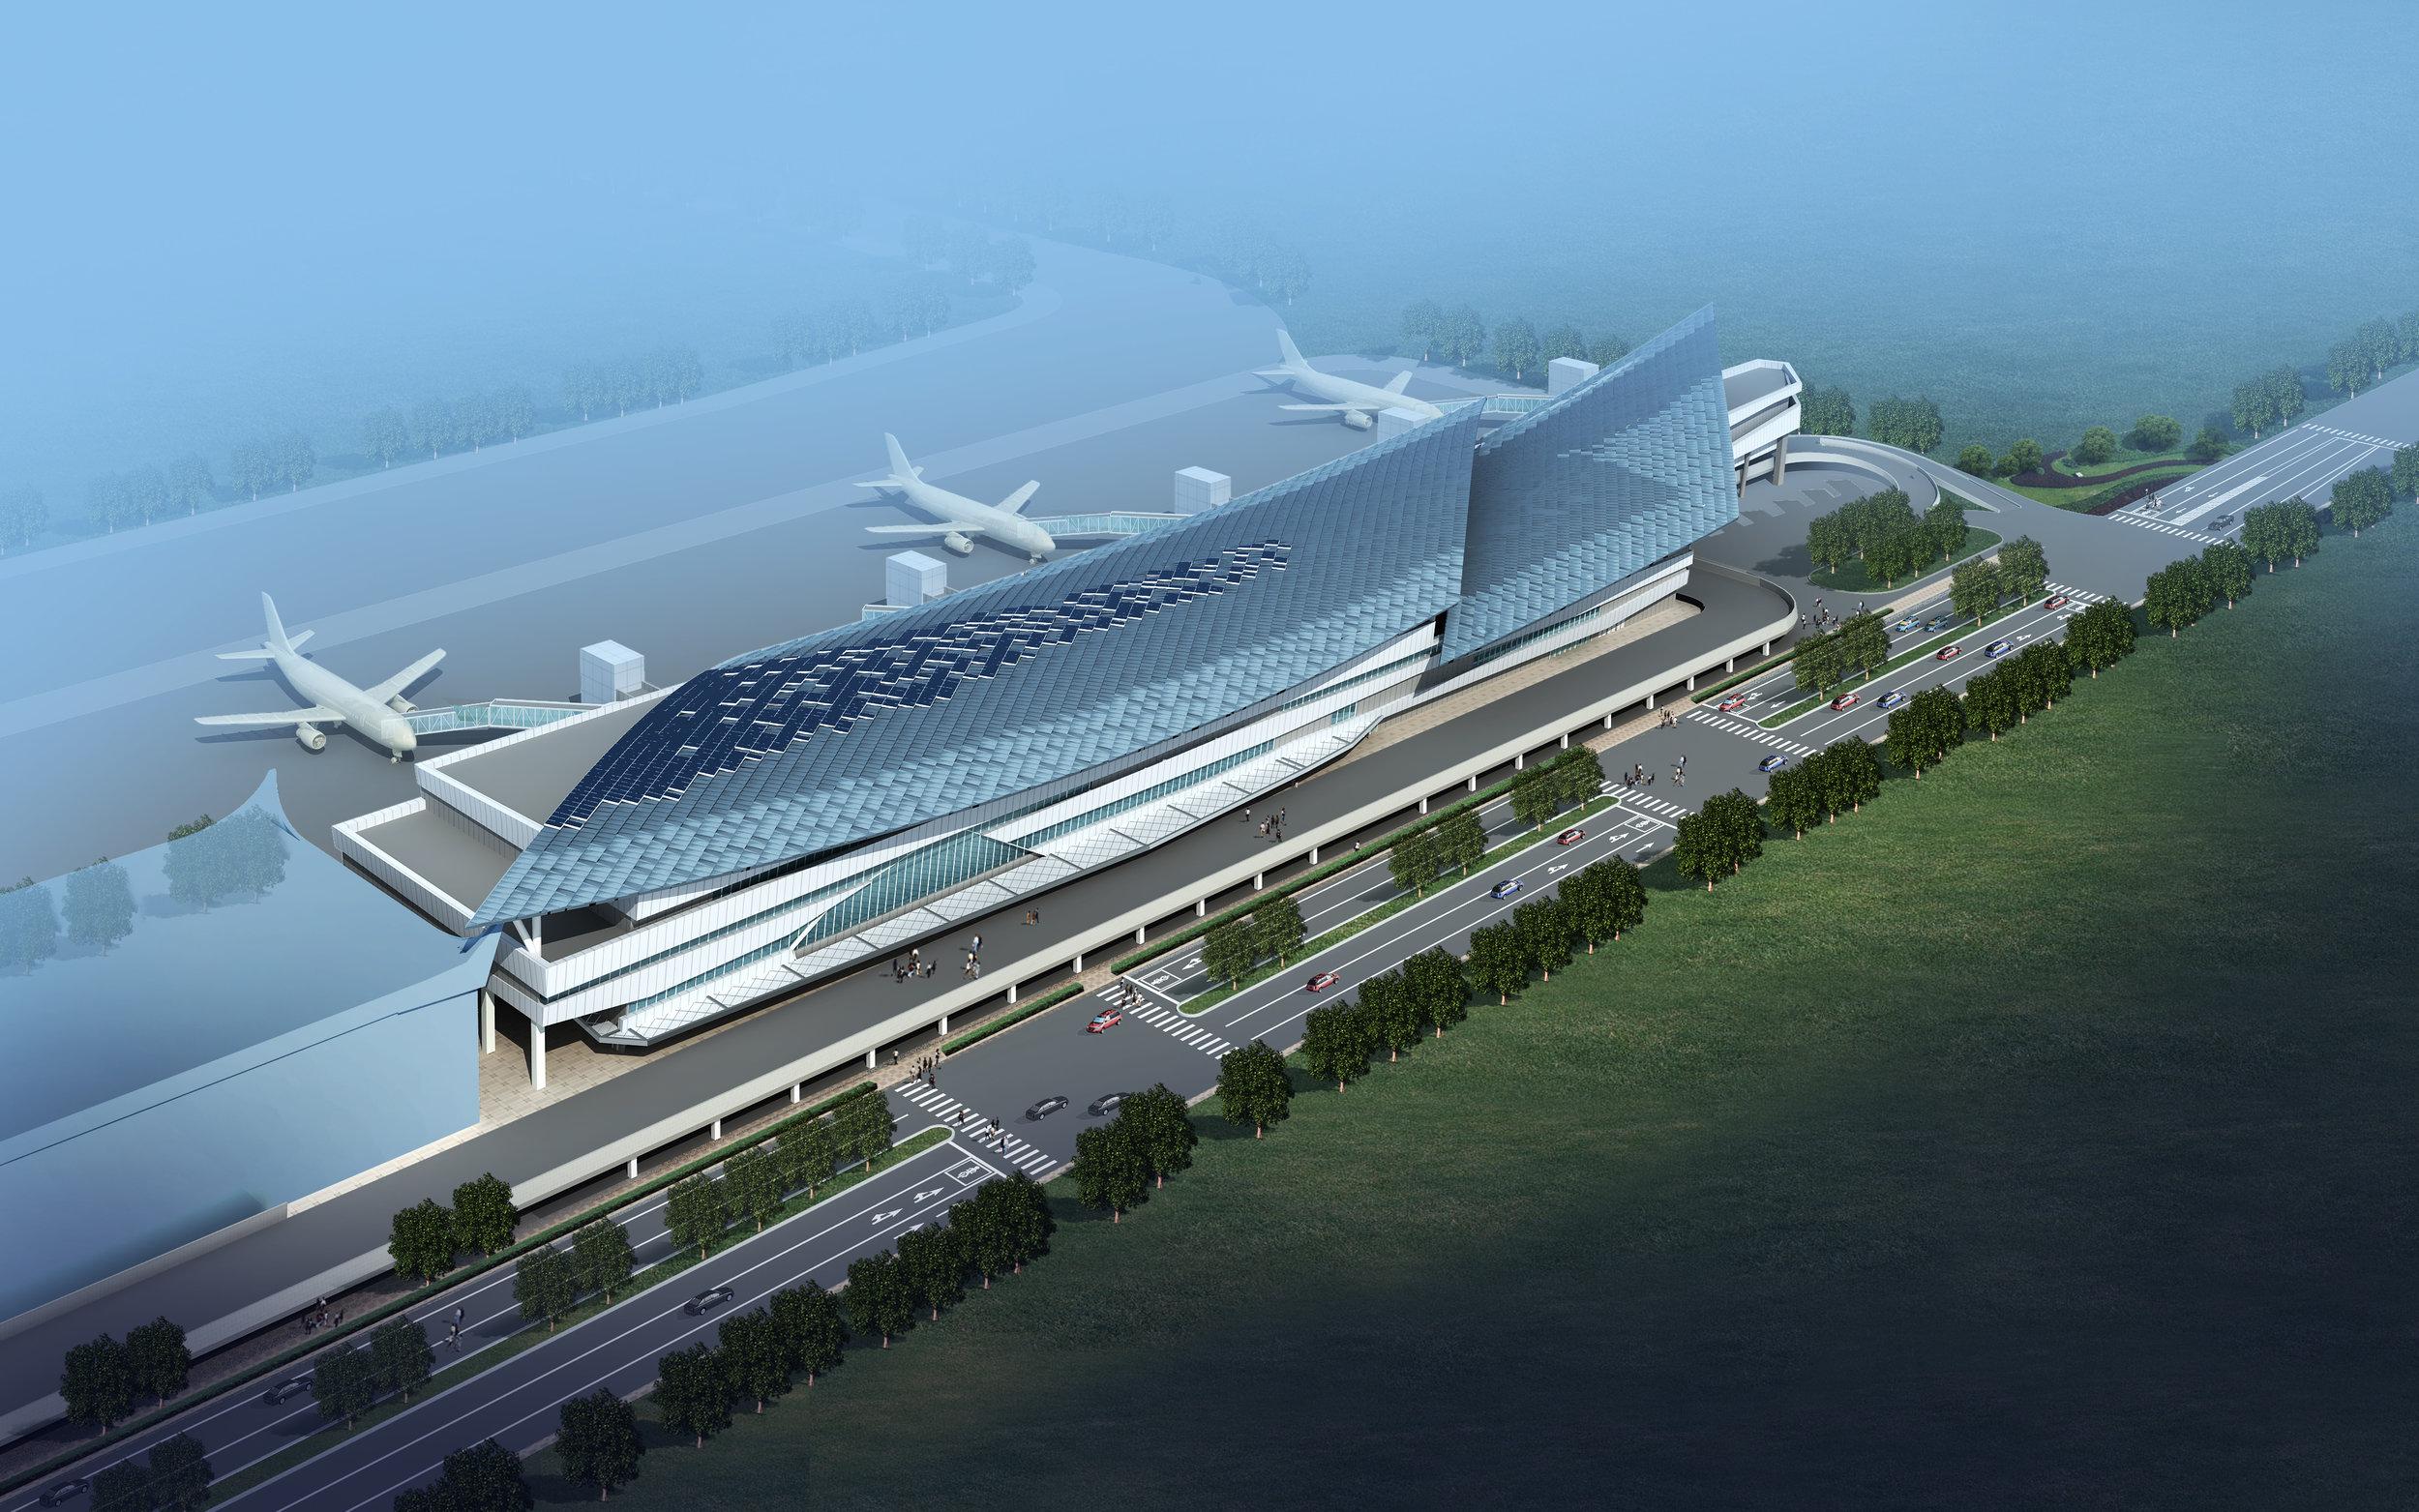 Taichung Int'l Airport<br>台中國際機場